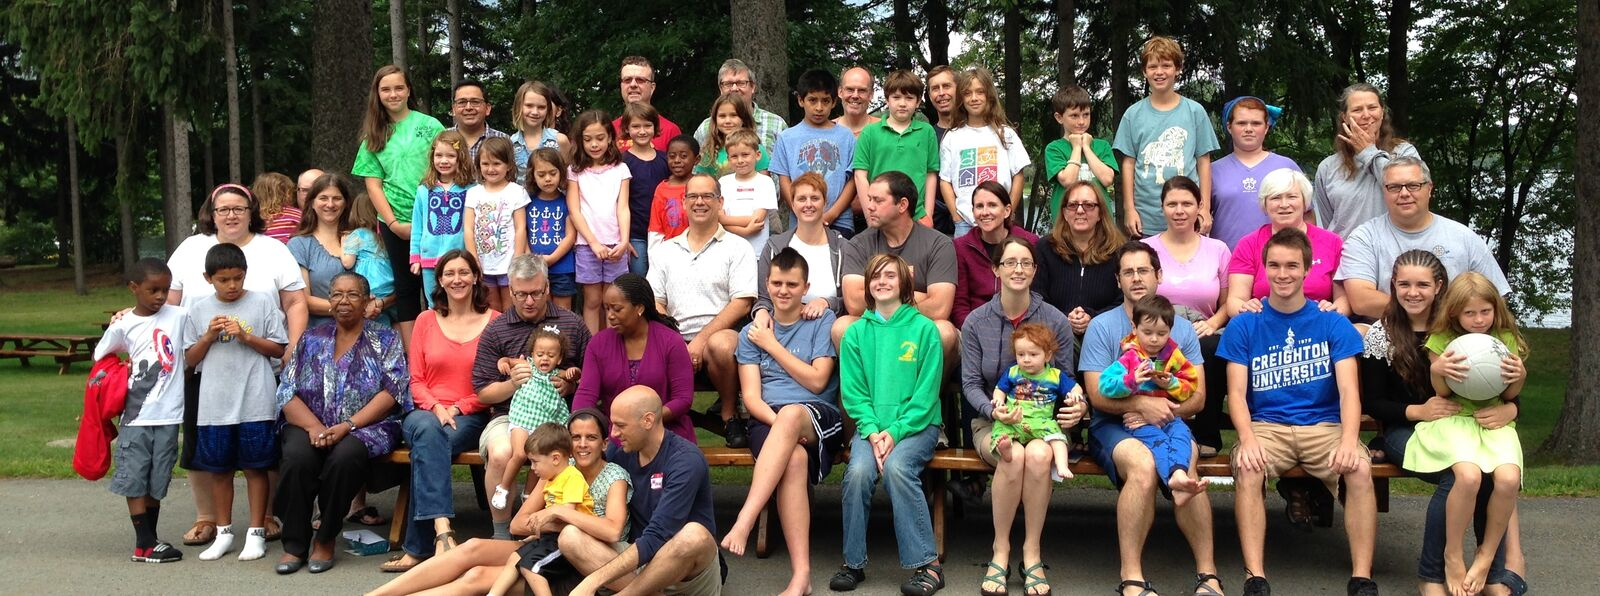 Scranton Family retreat 2014